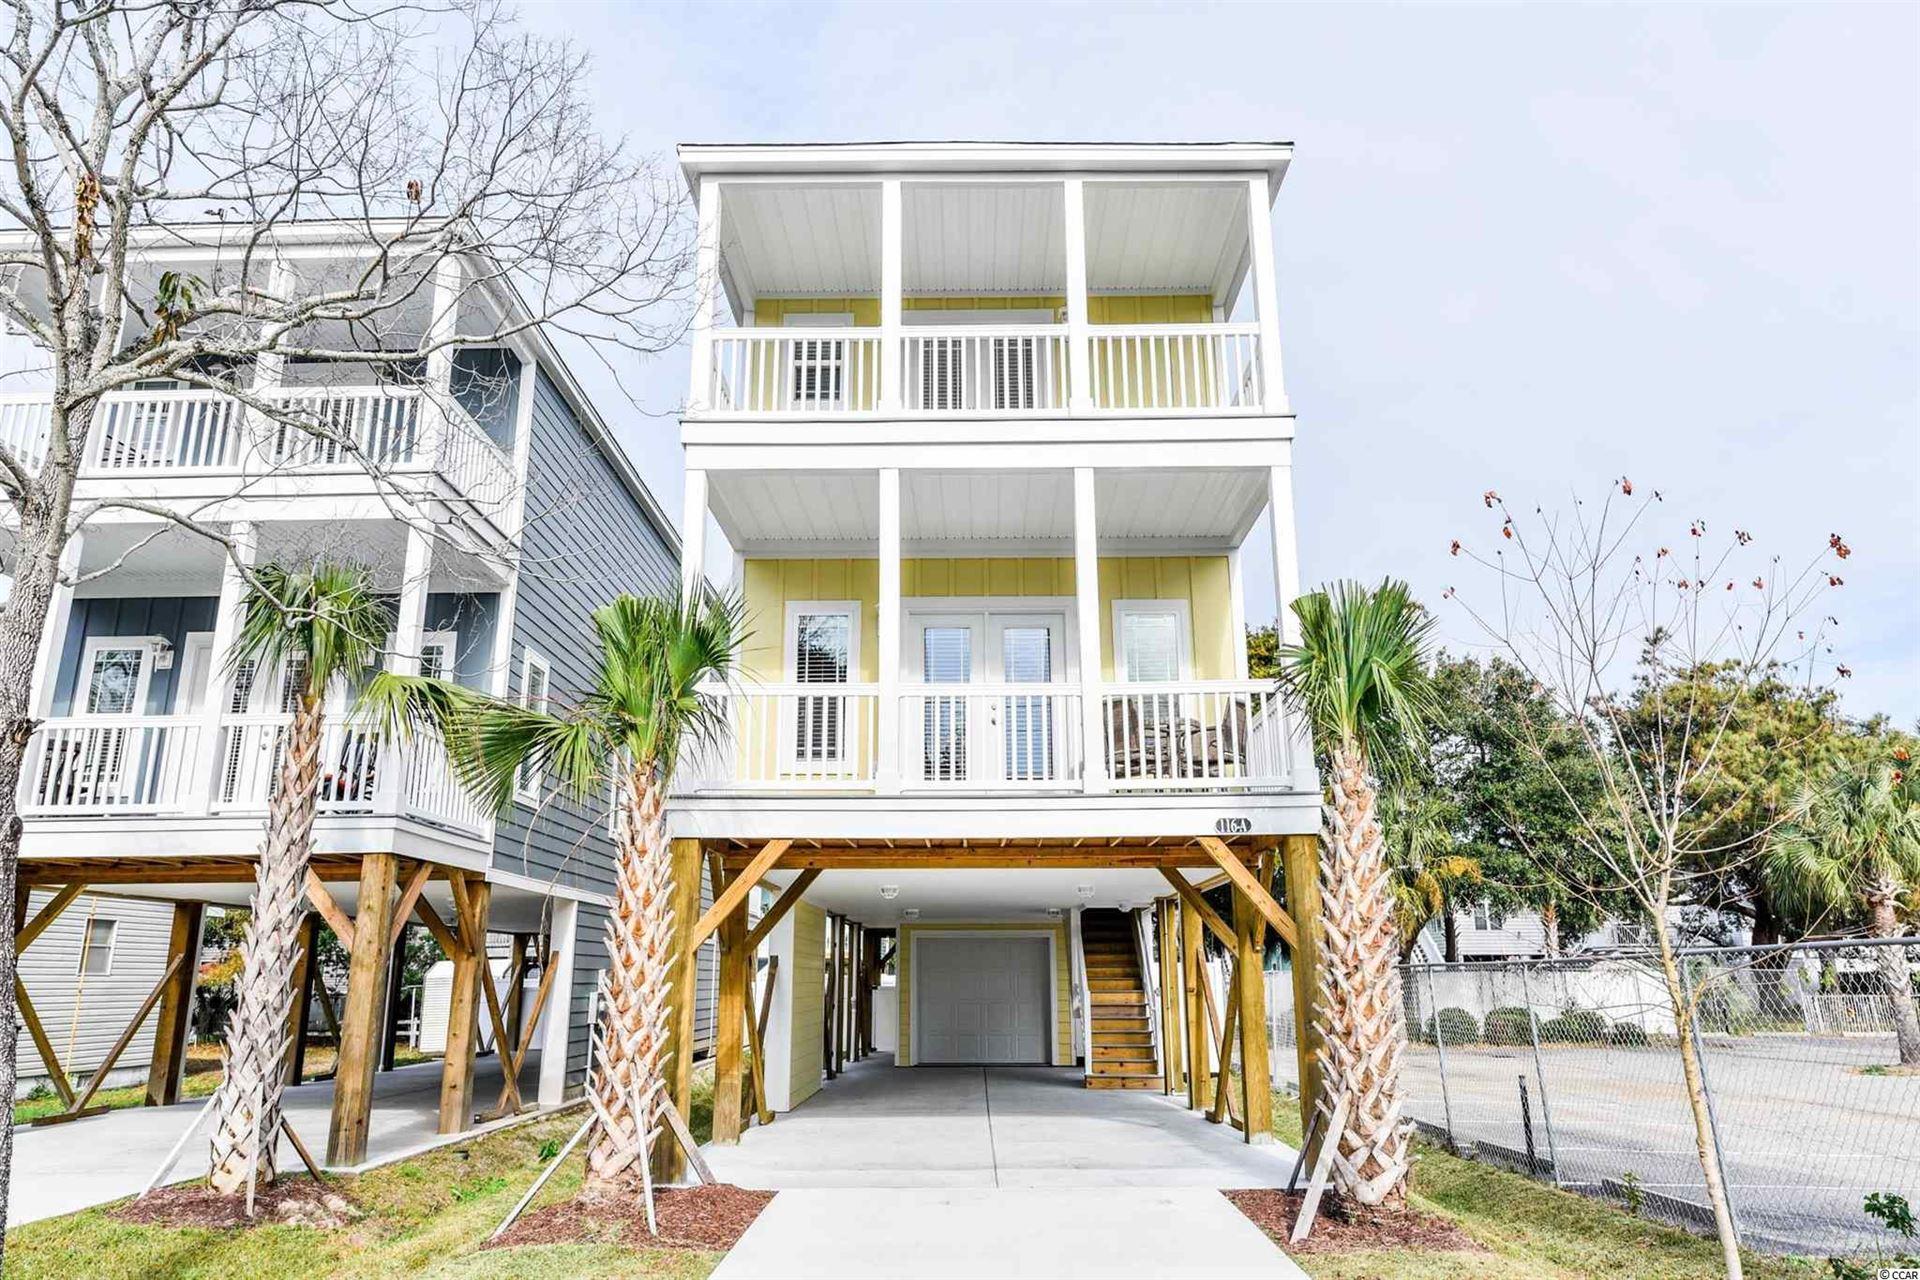 913 A South Lakeside Dr., Surfside Beach, SC 29575 - MLS#: 2113361